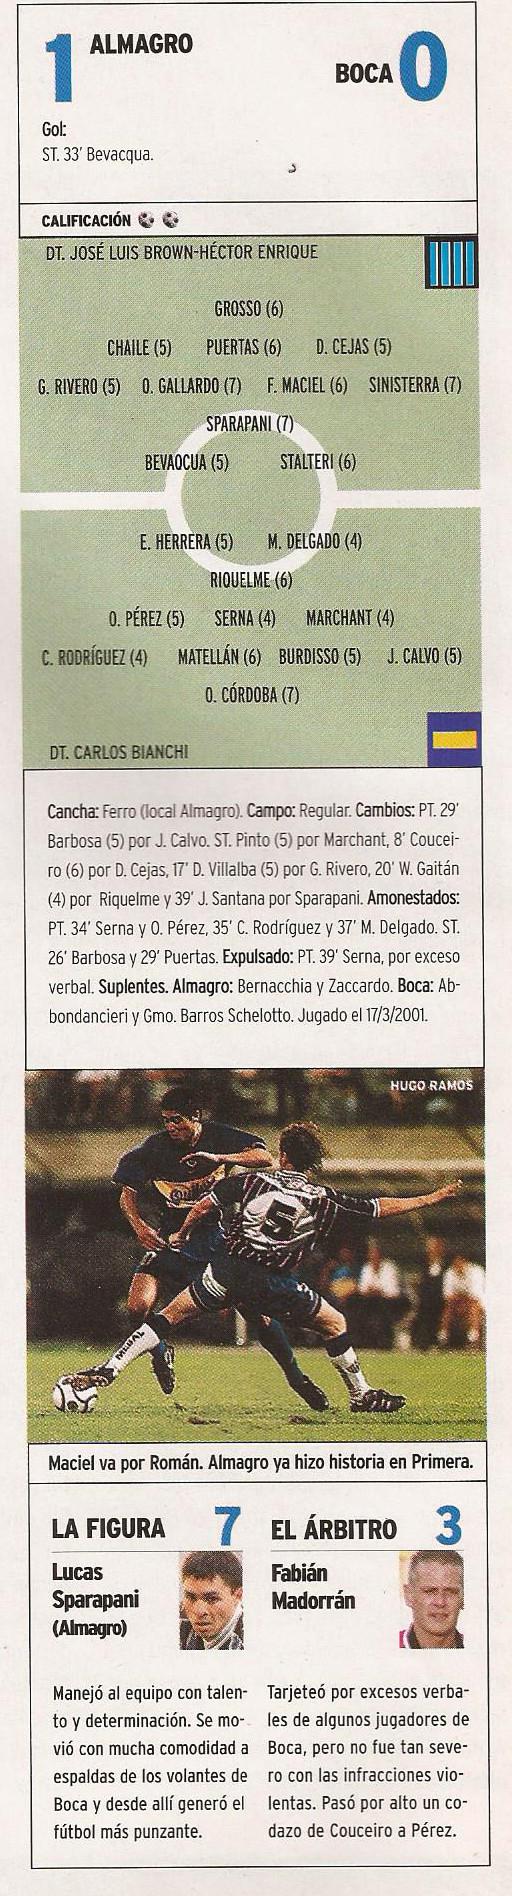 2000-01 Primera Division - Almagro vs Boca Jrs - ficha - El Grafico